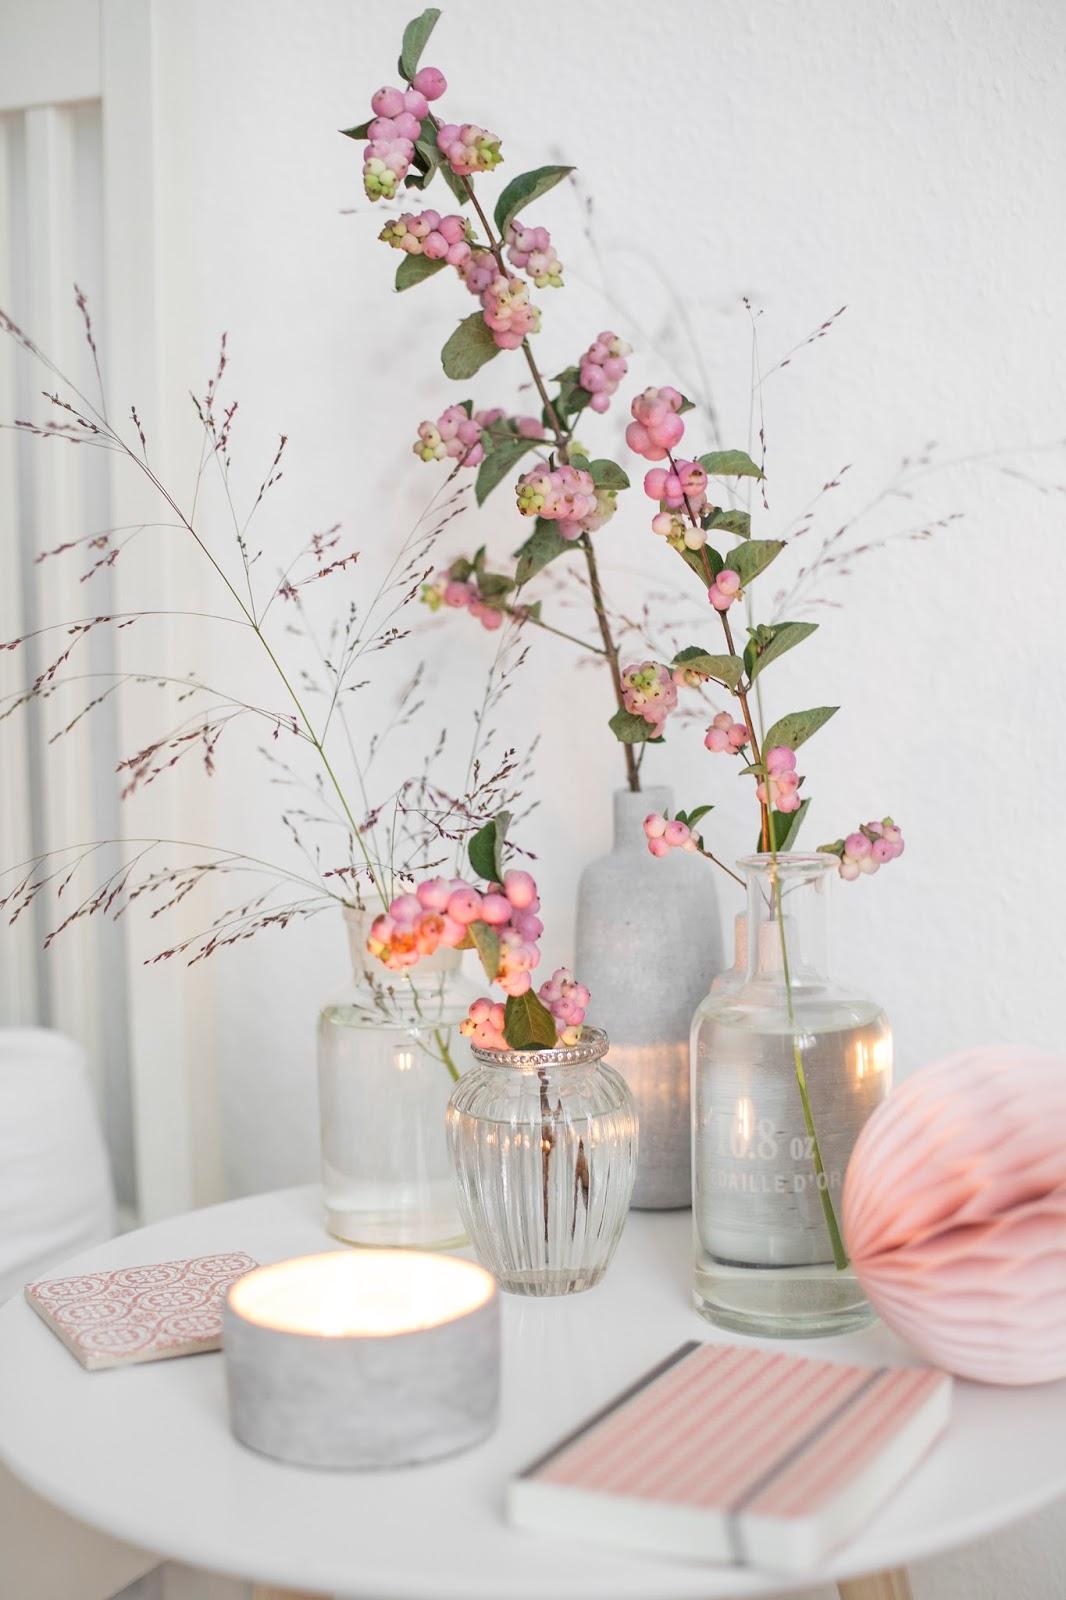 Sonntagsfrühstück im Bett Blumendeko